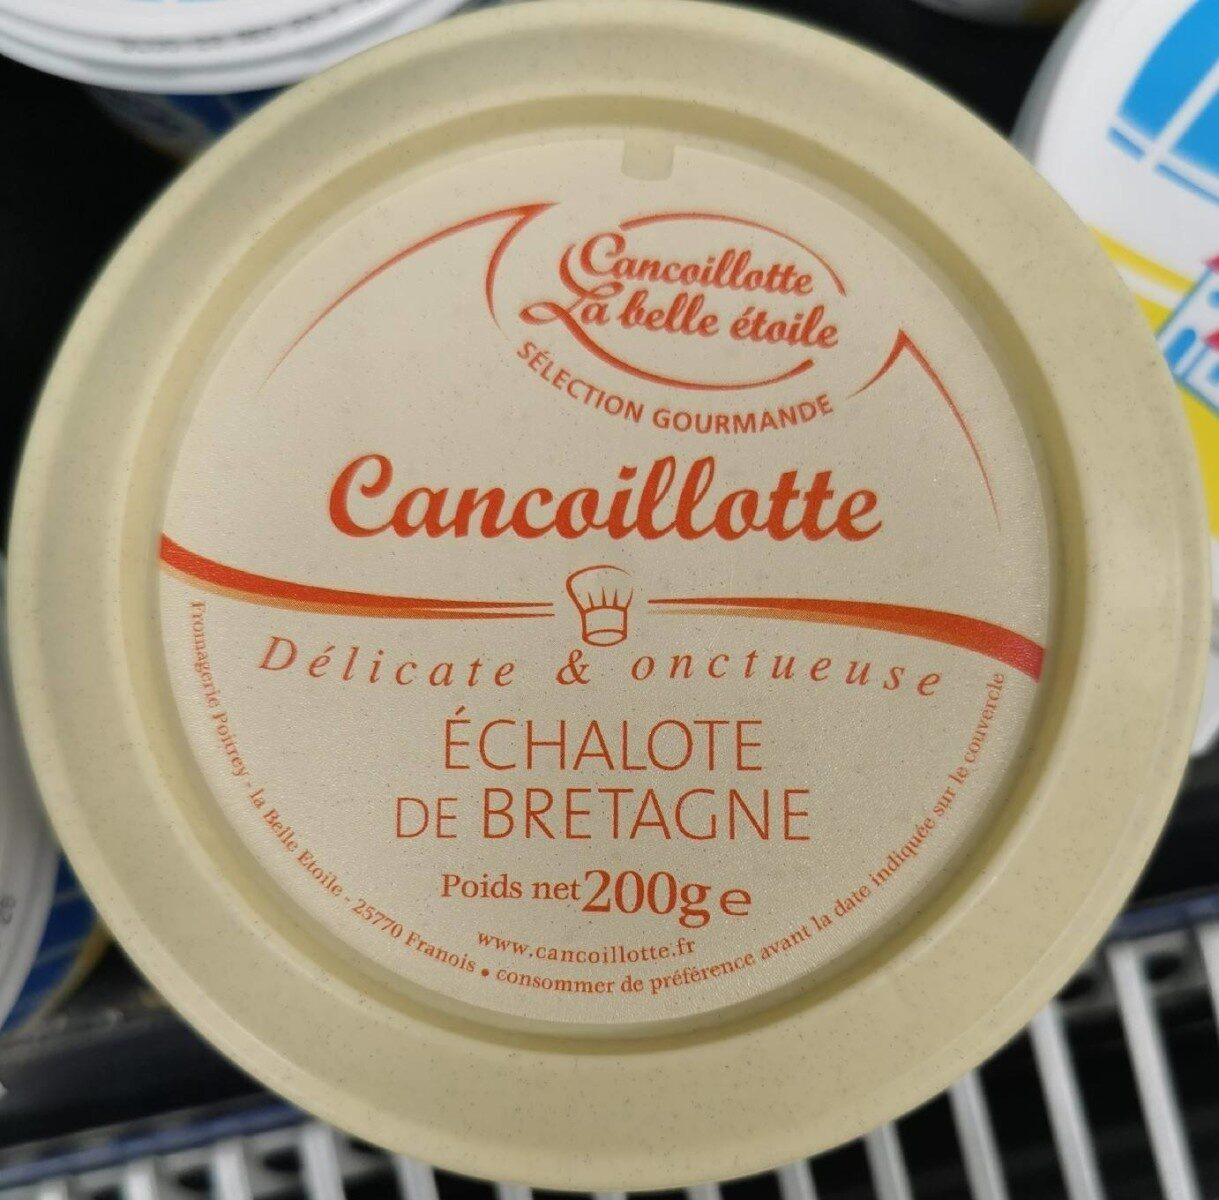 Cancoillotte gourmande Echalote de Bretagne - Produit - fr